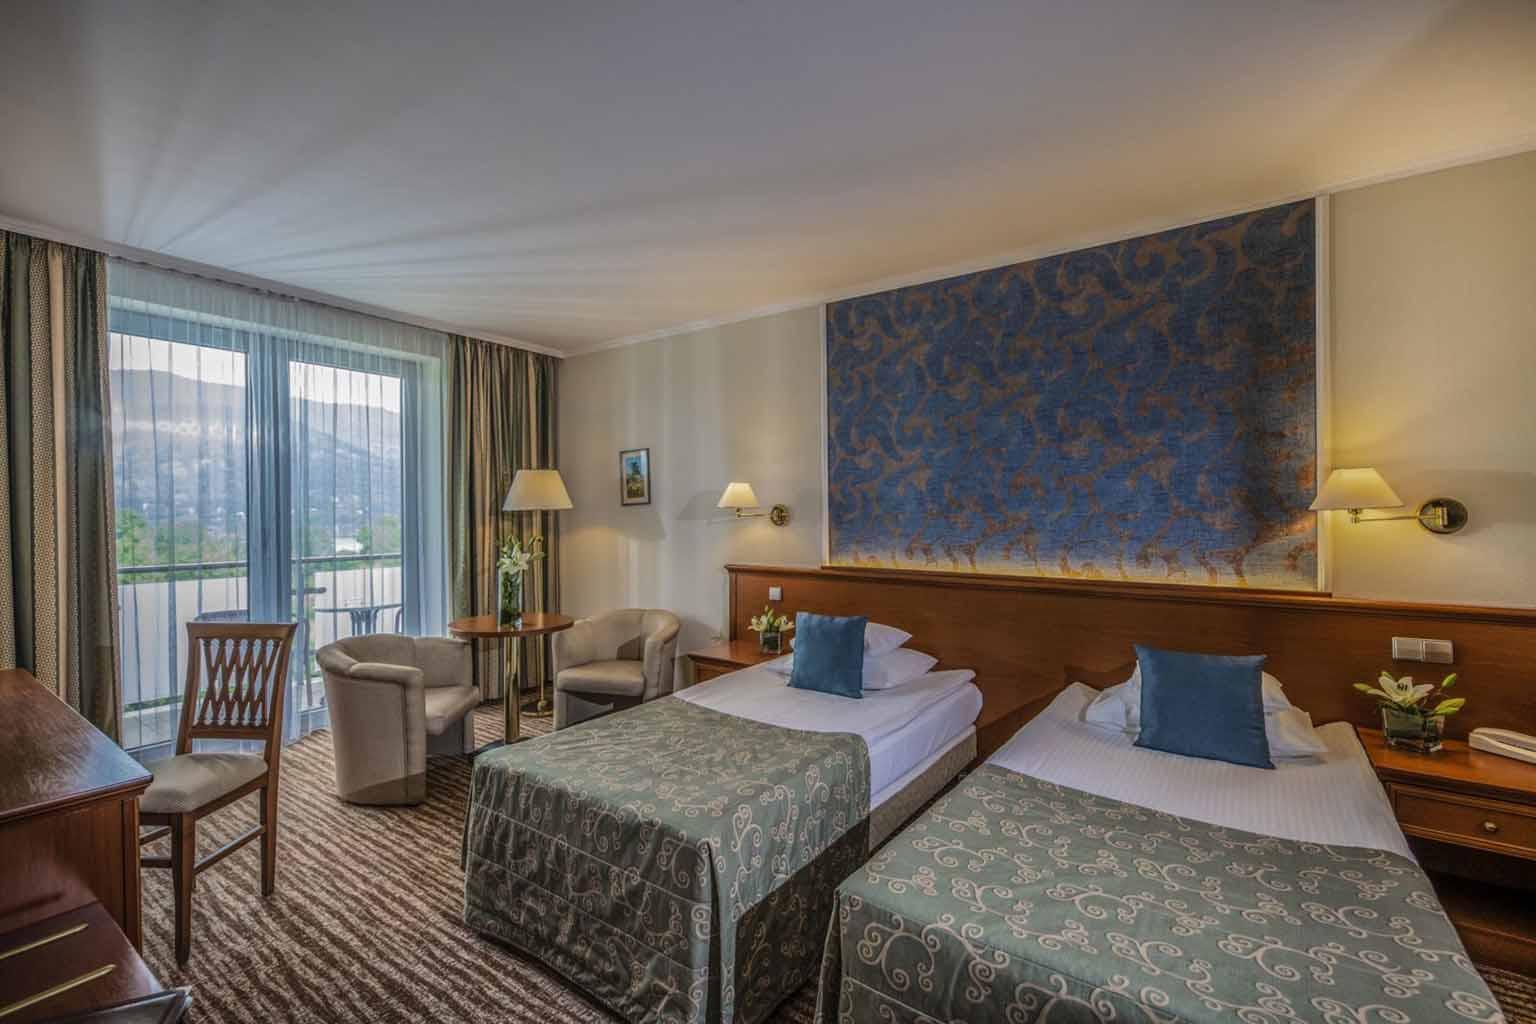 thermal-hotel-visegrad-szalloda-dunakanyarra-nezo-ketagyas-szoba5